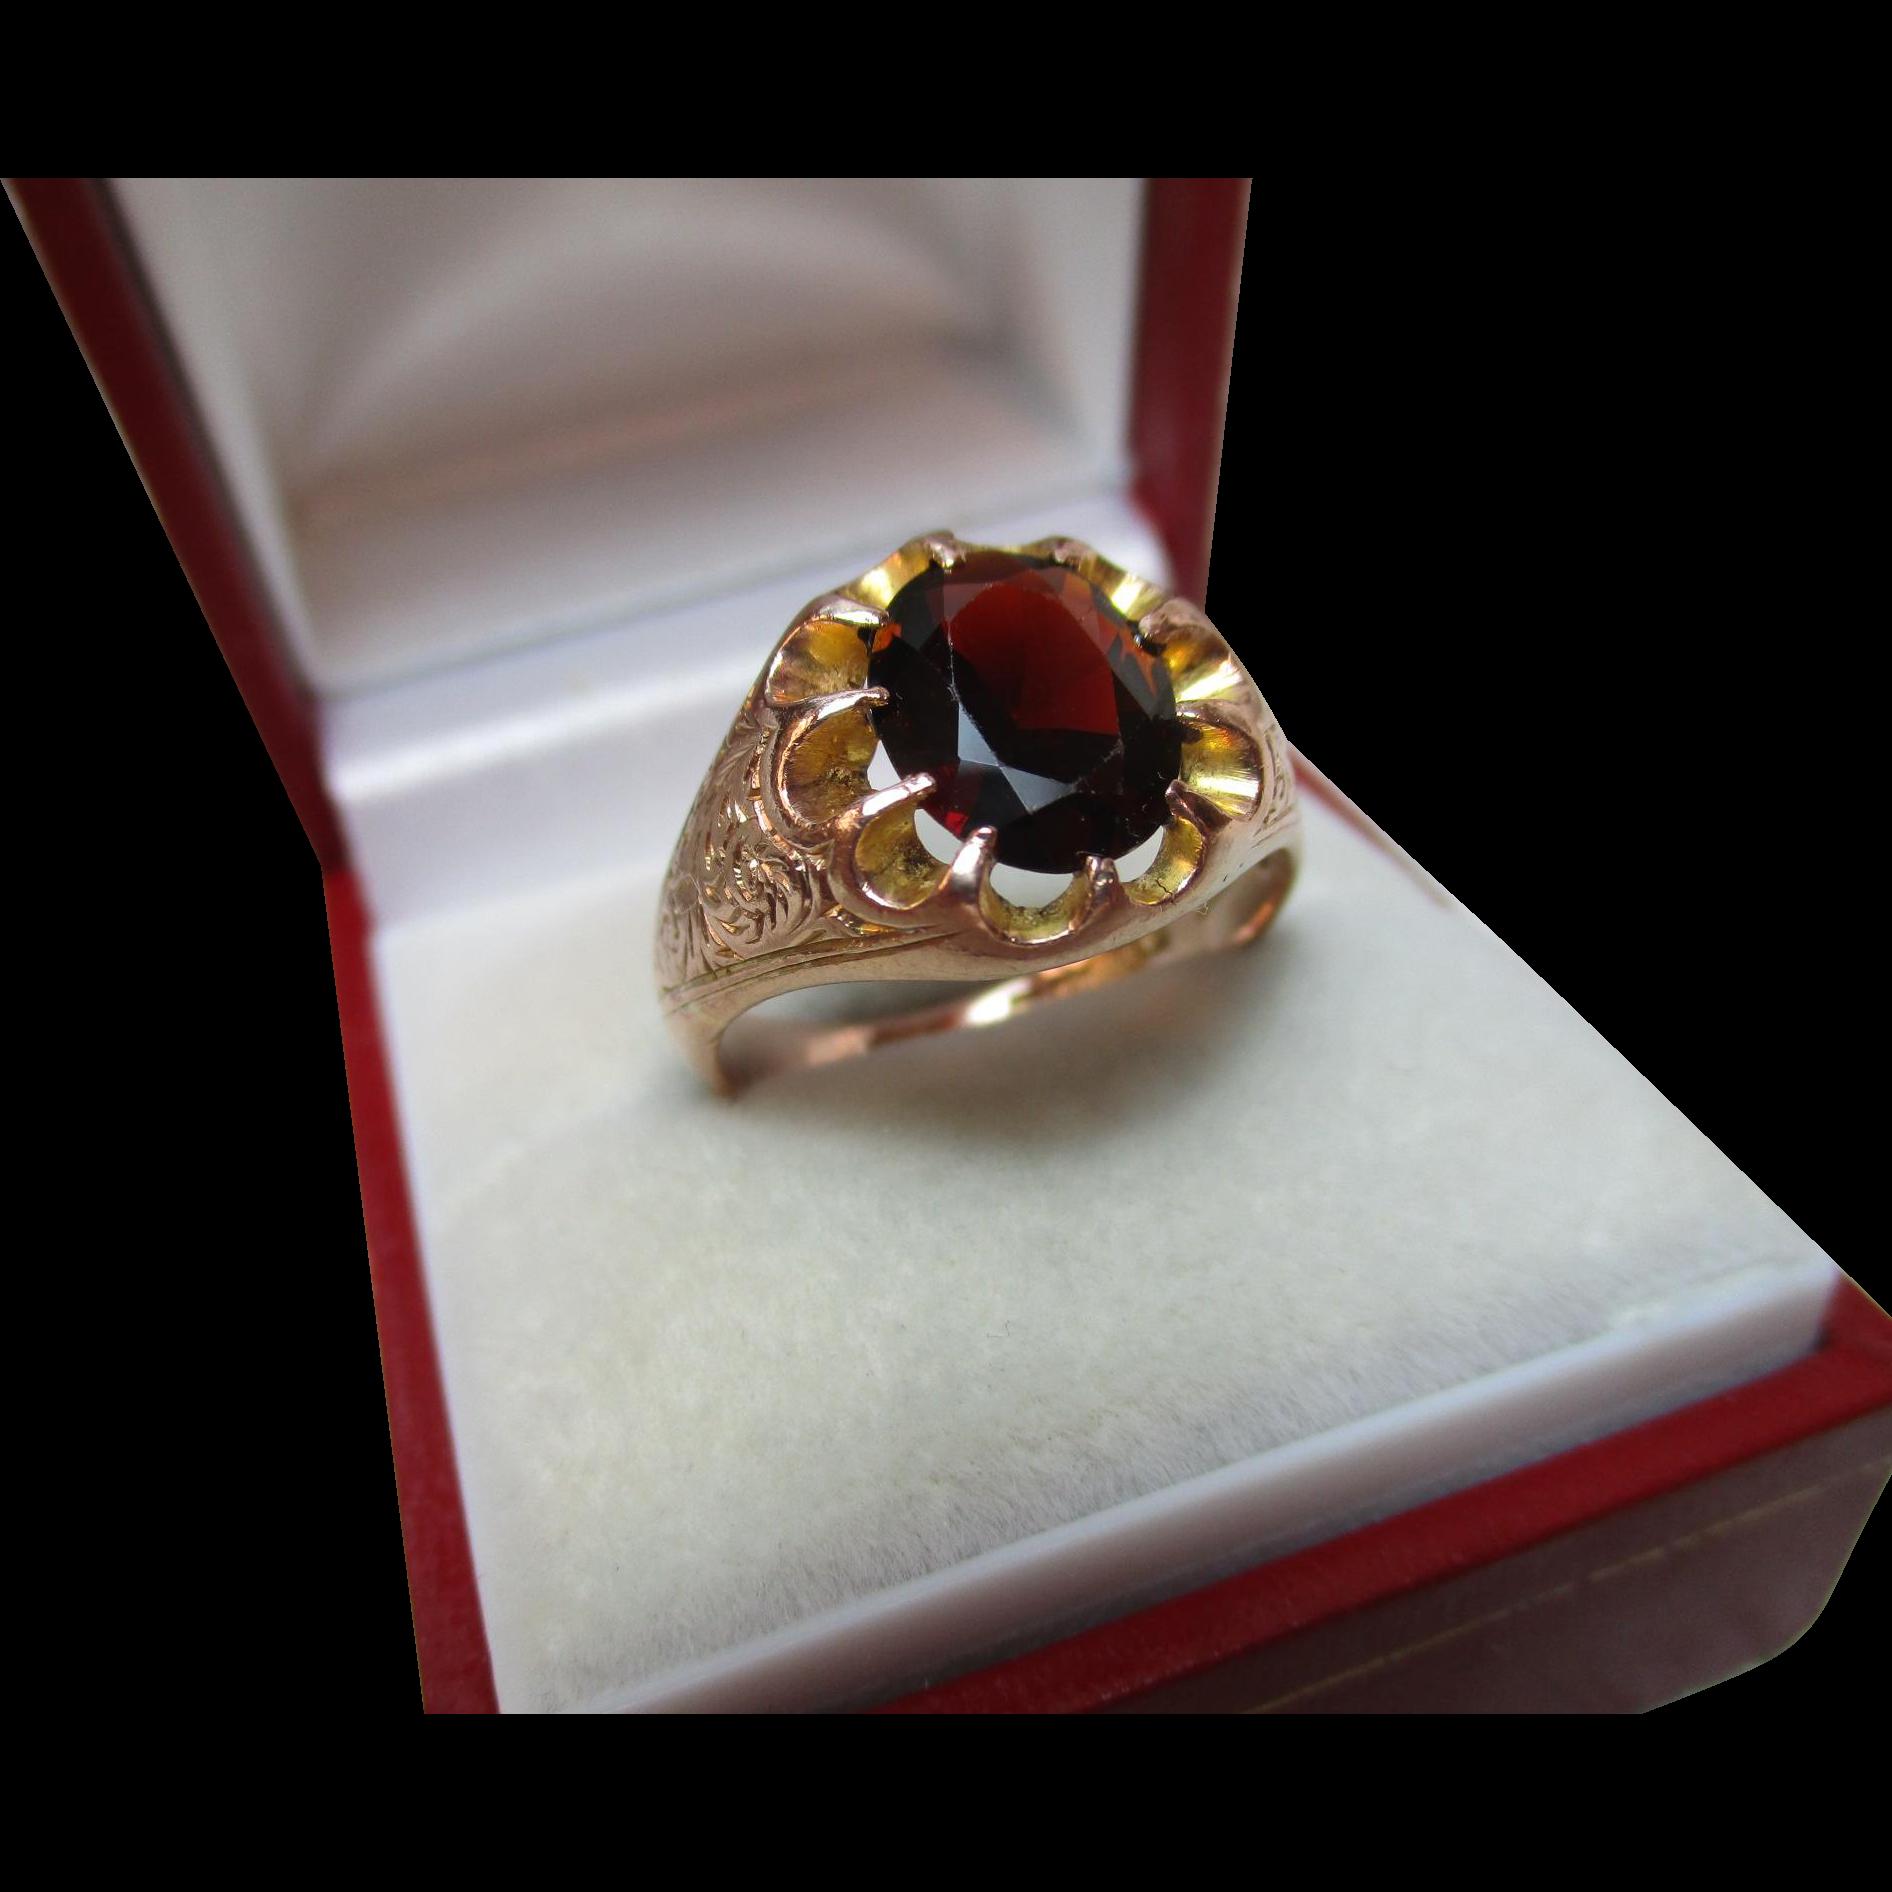 Superb birmingham 1920 9ct solid rose gold 39 cushion for Sell jewelry birmingham al